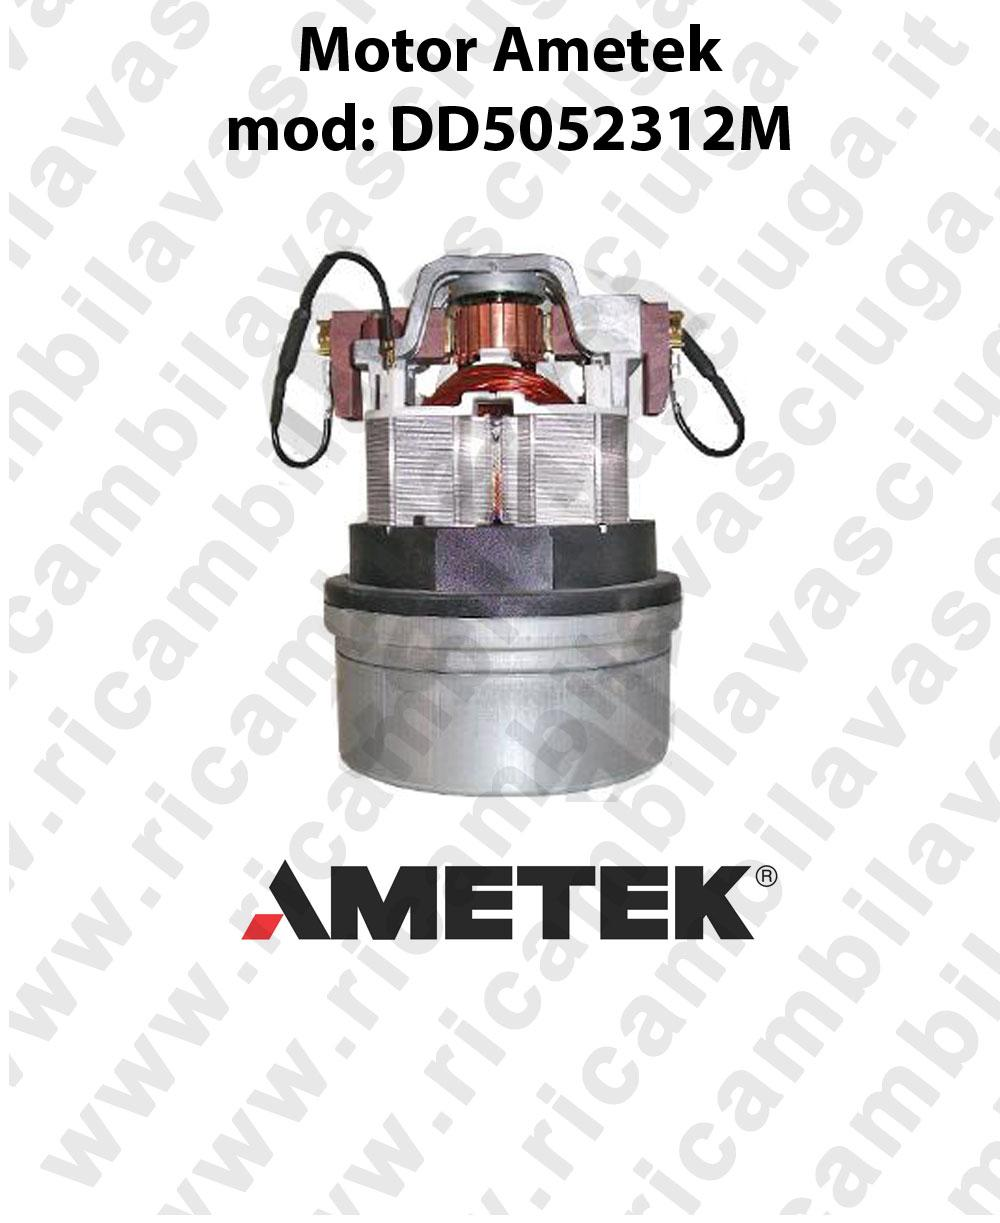 Vacuum motor mod. DD5052312M AMETEK for vacuum cleaner e scrubber dryer